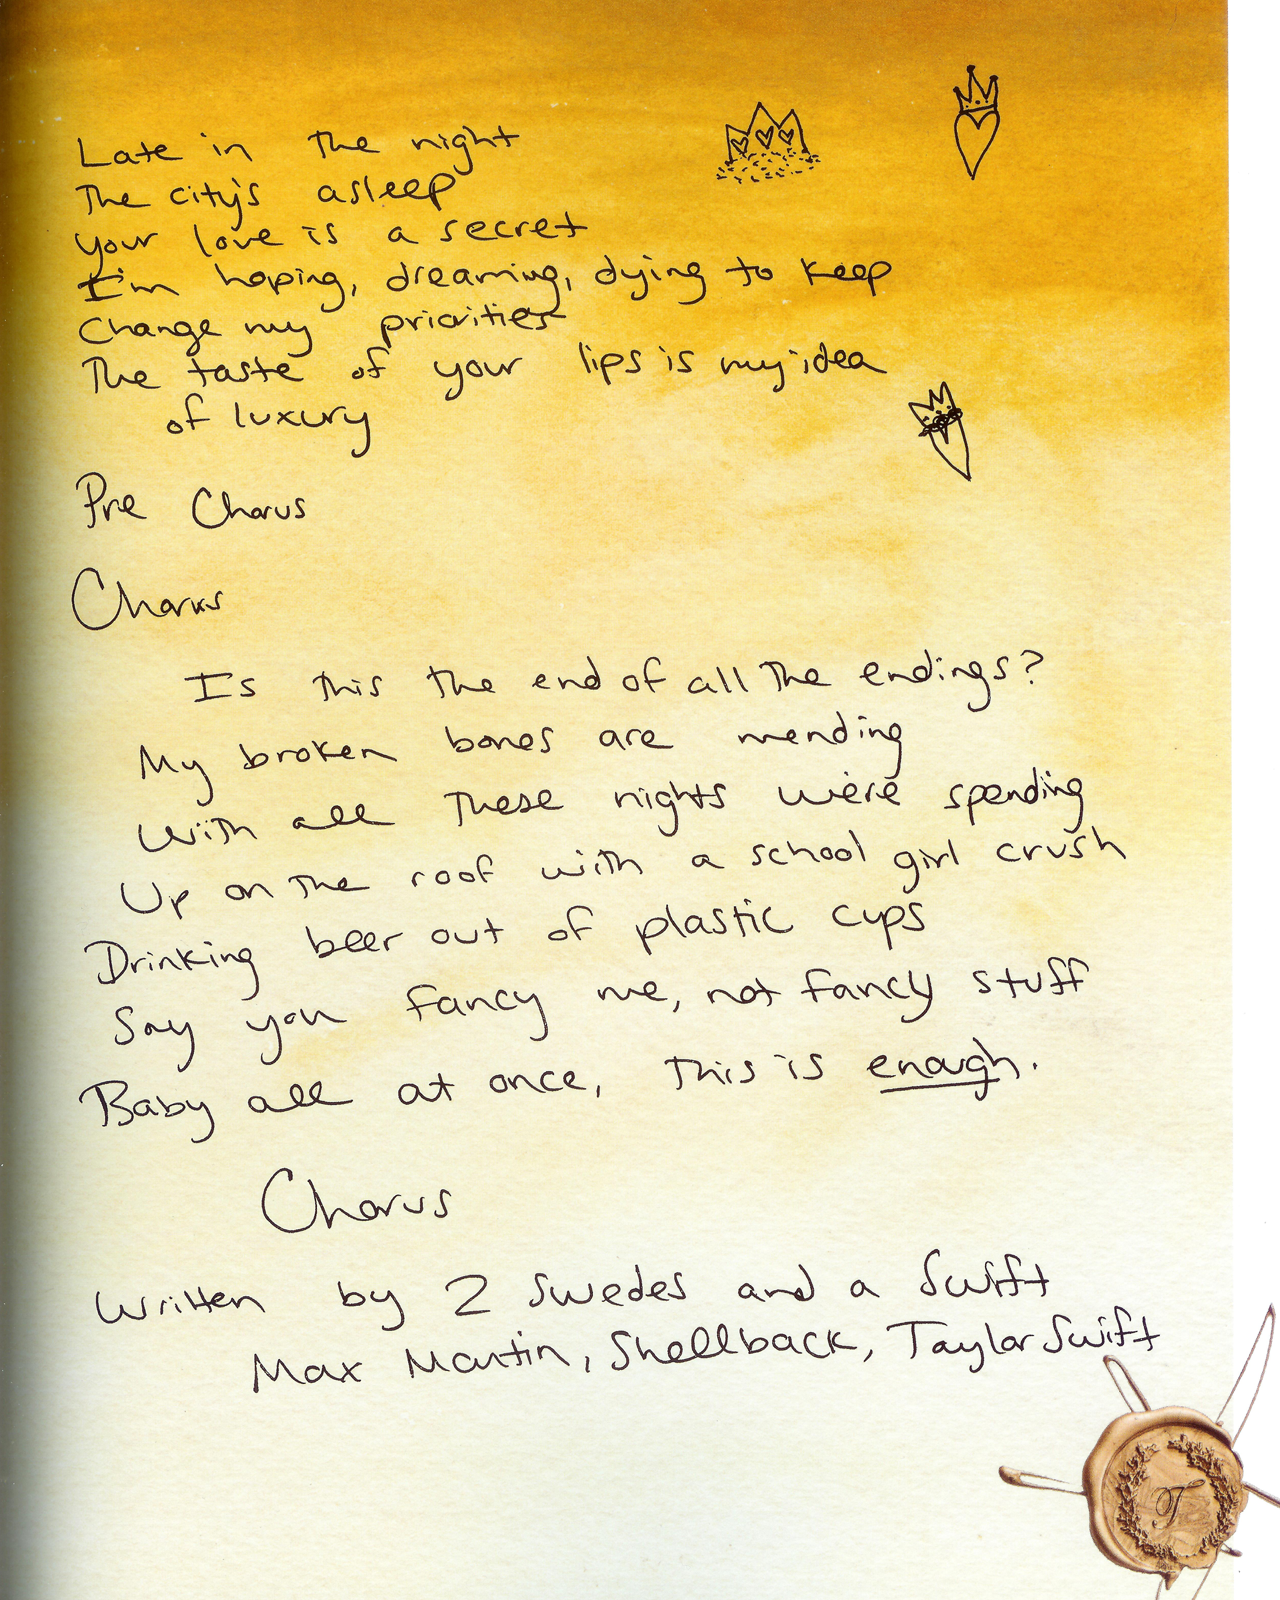 Tswiftly Handwritten Lyrics From Reputation Vol 2 Taylor Swift Lyrics Taylor Lyrics Taylor Swift Songs